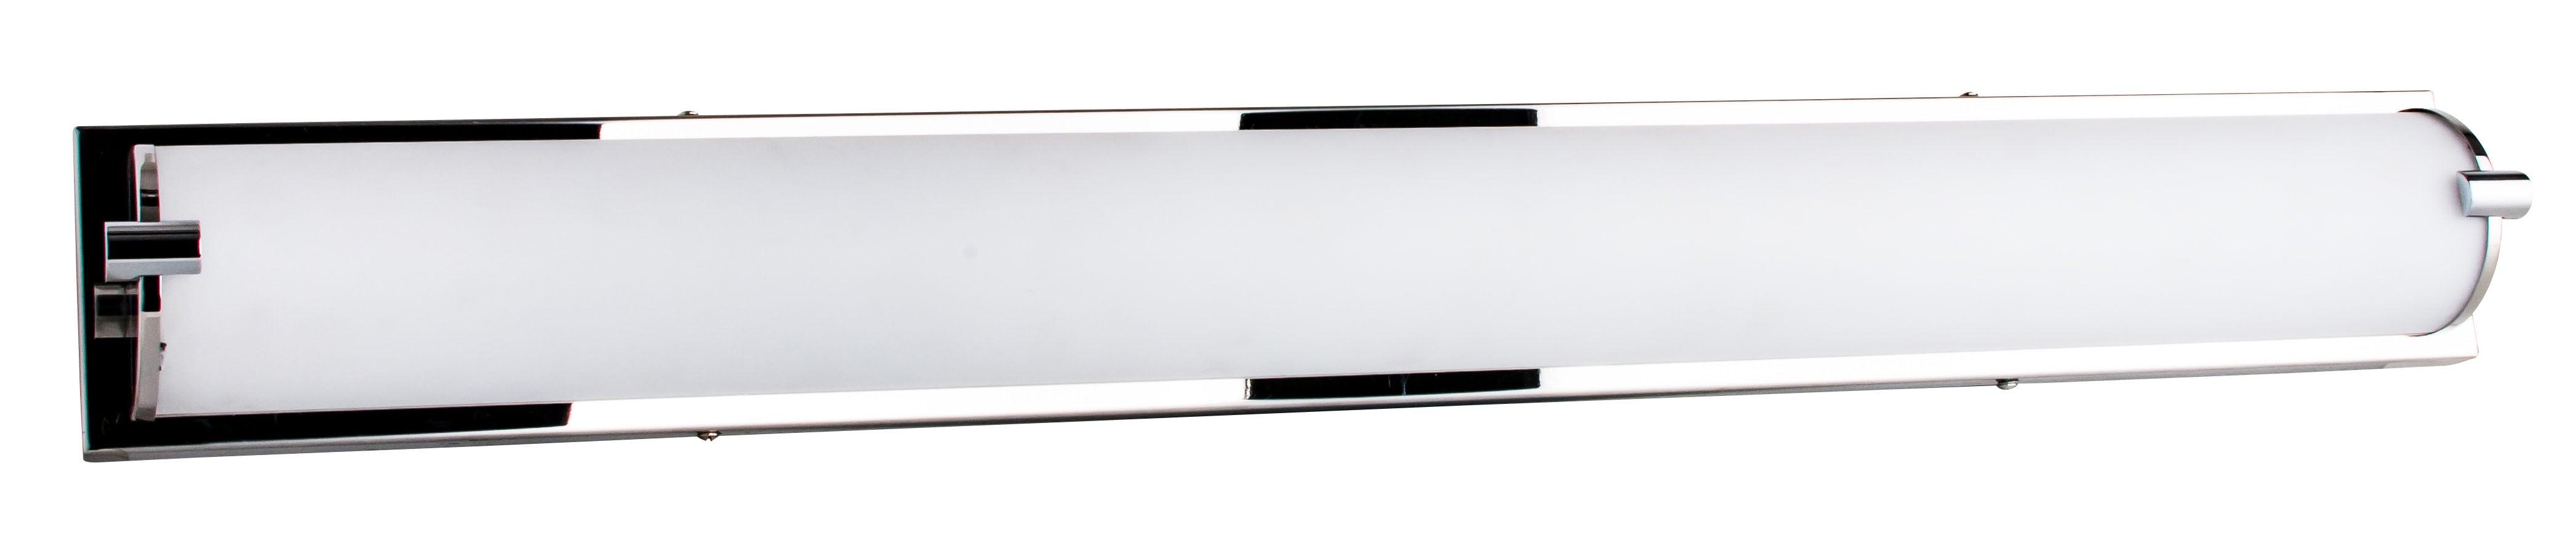 Wall lamp Romy chromowany / white LED 40W